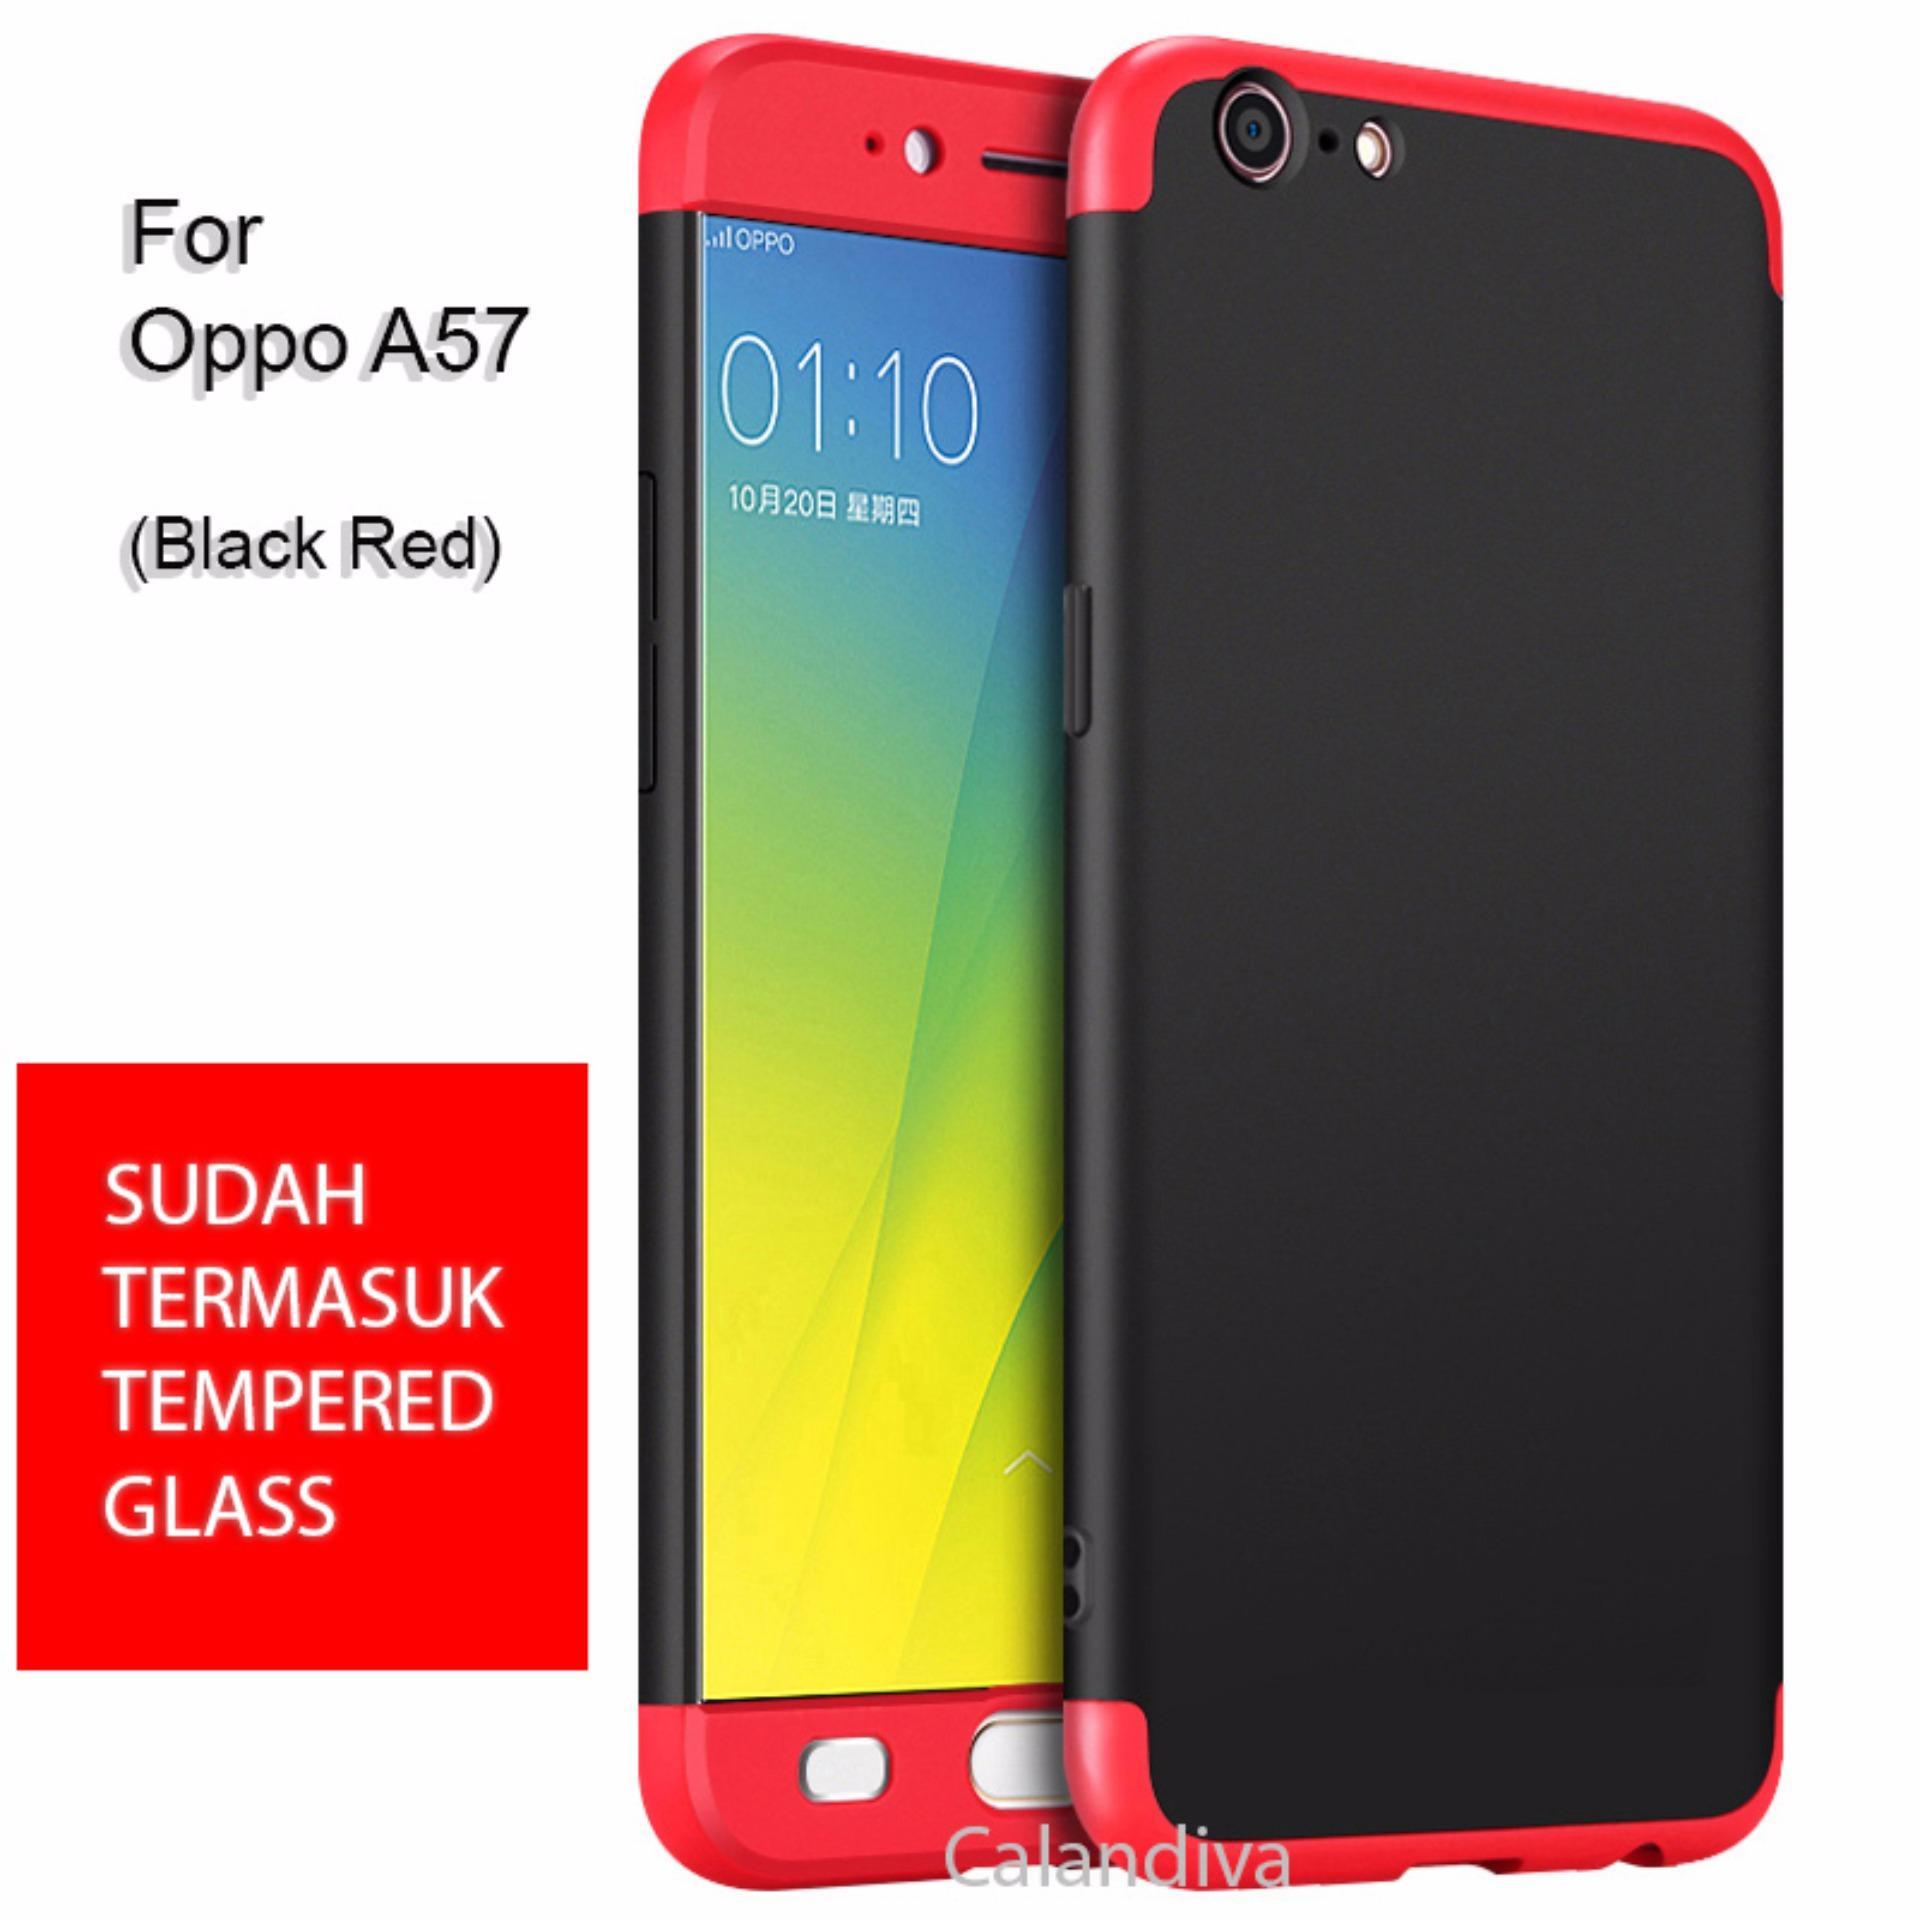 Harga Calandiva Premium Front Back 360 Degree Full Protection Case Quality Grade A For Oppo A57 Tempered Glass 2 5D Bening Calandiva Asli